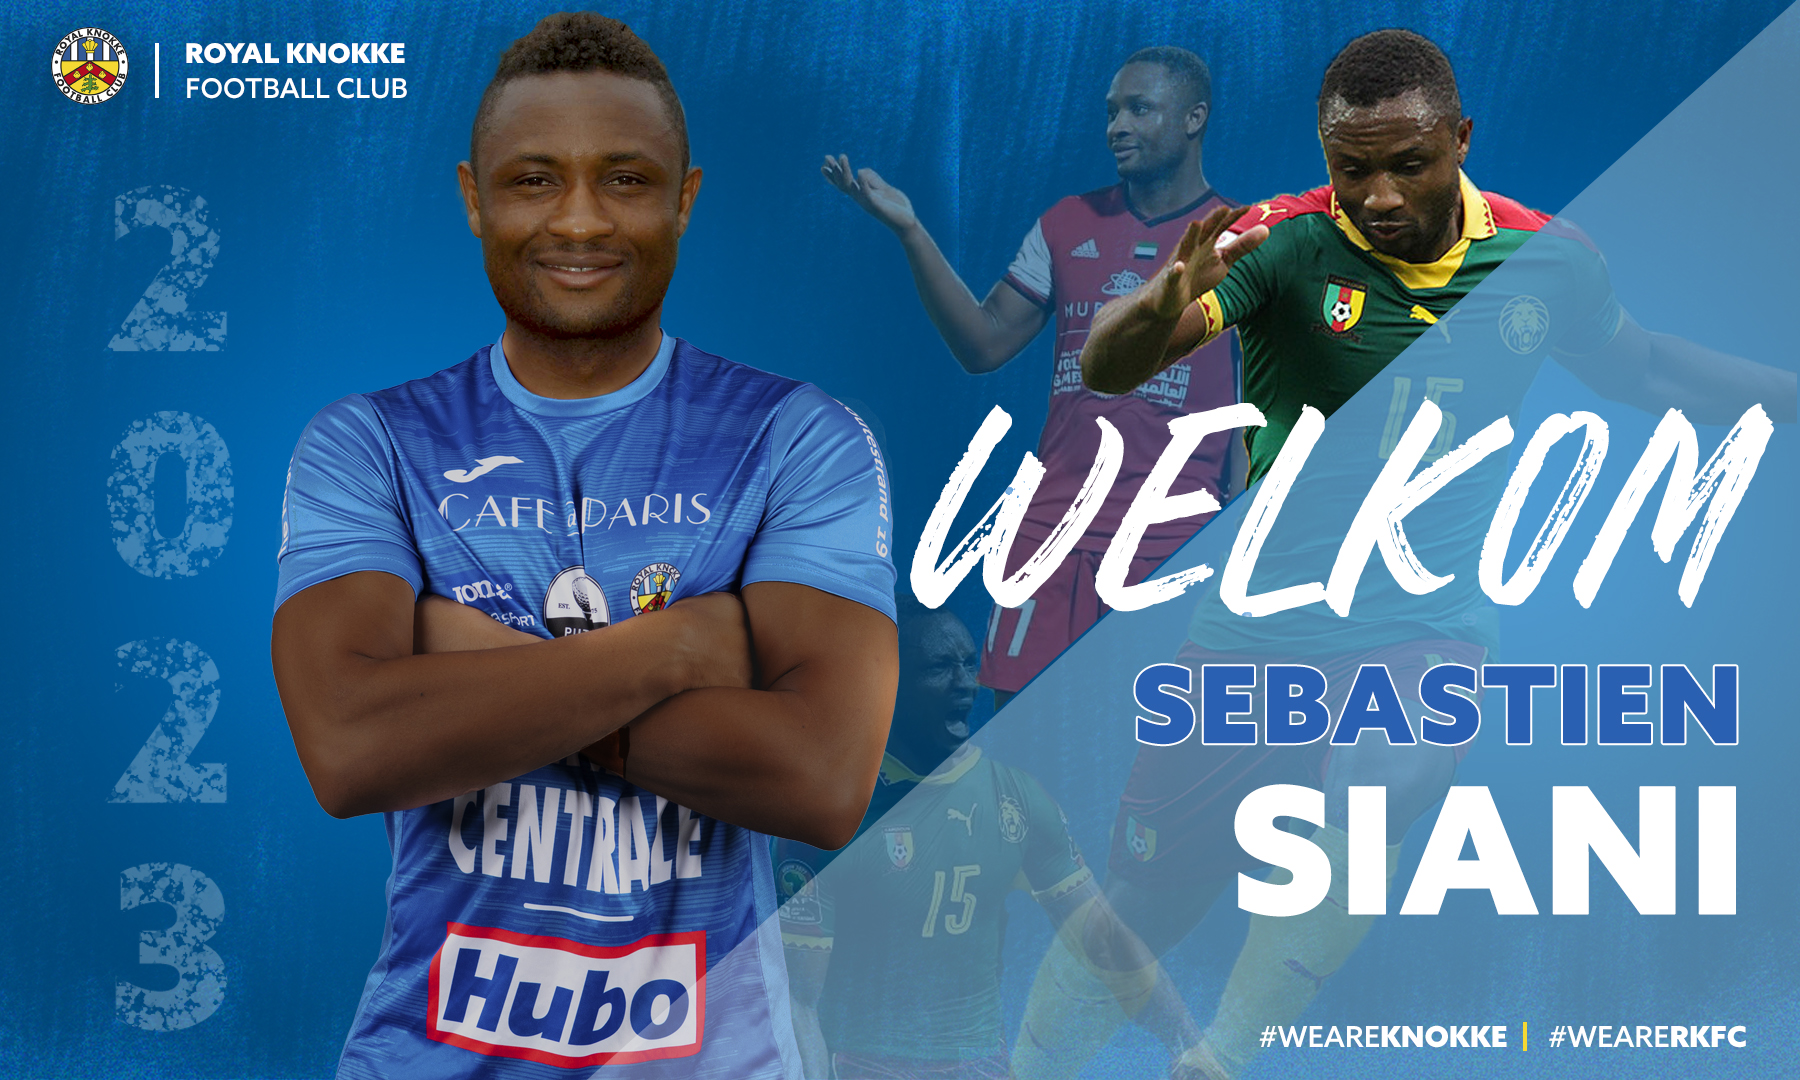 Welkom Sebastien Siani!